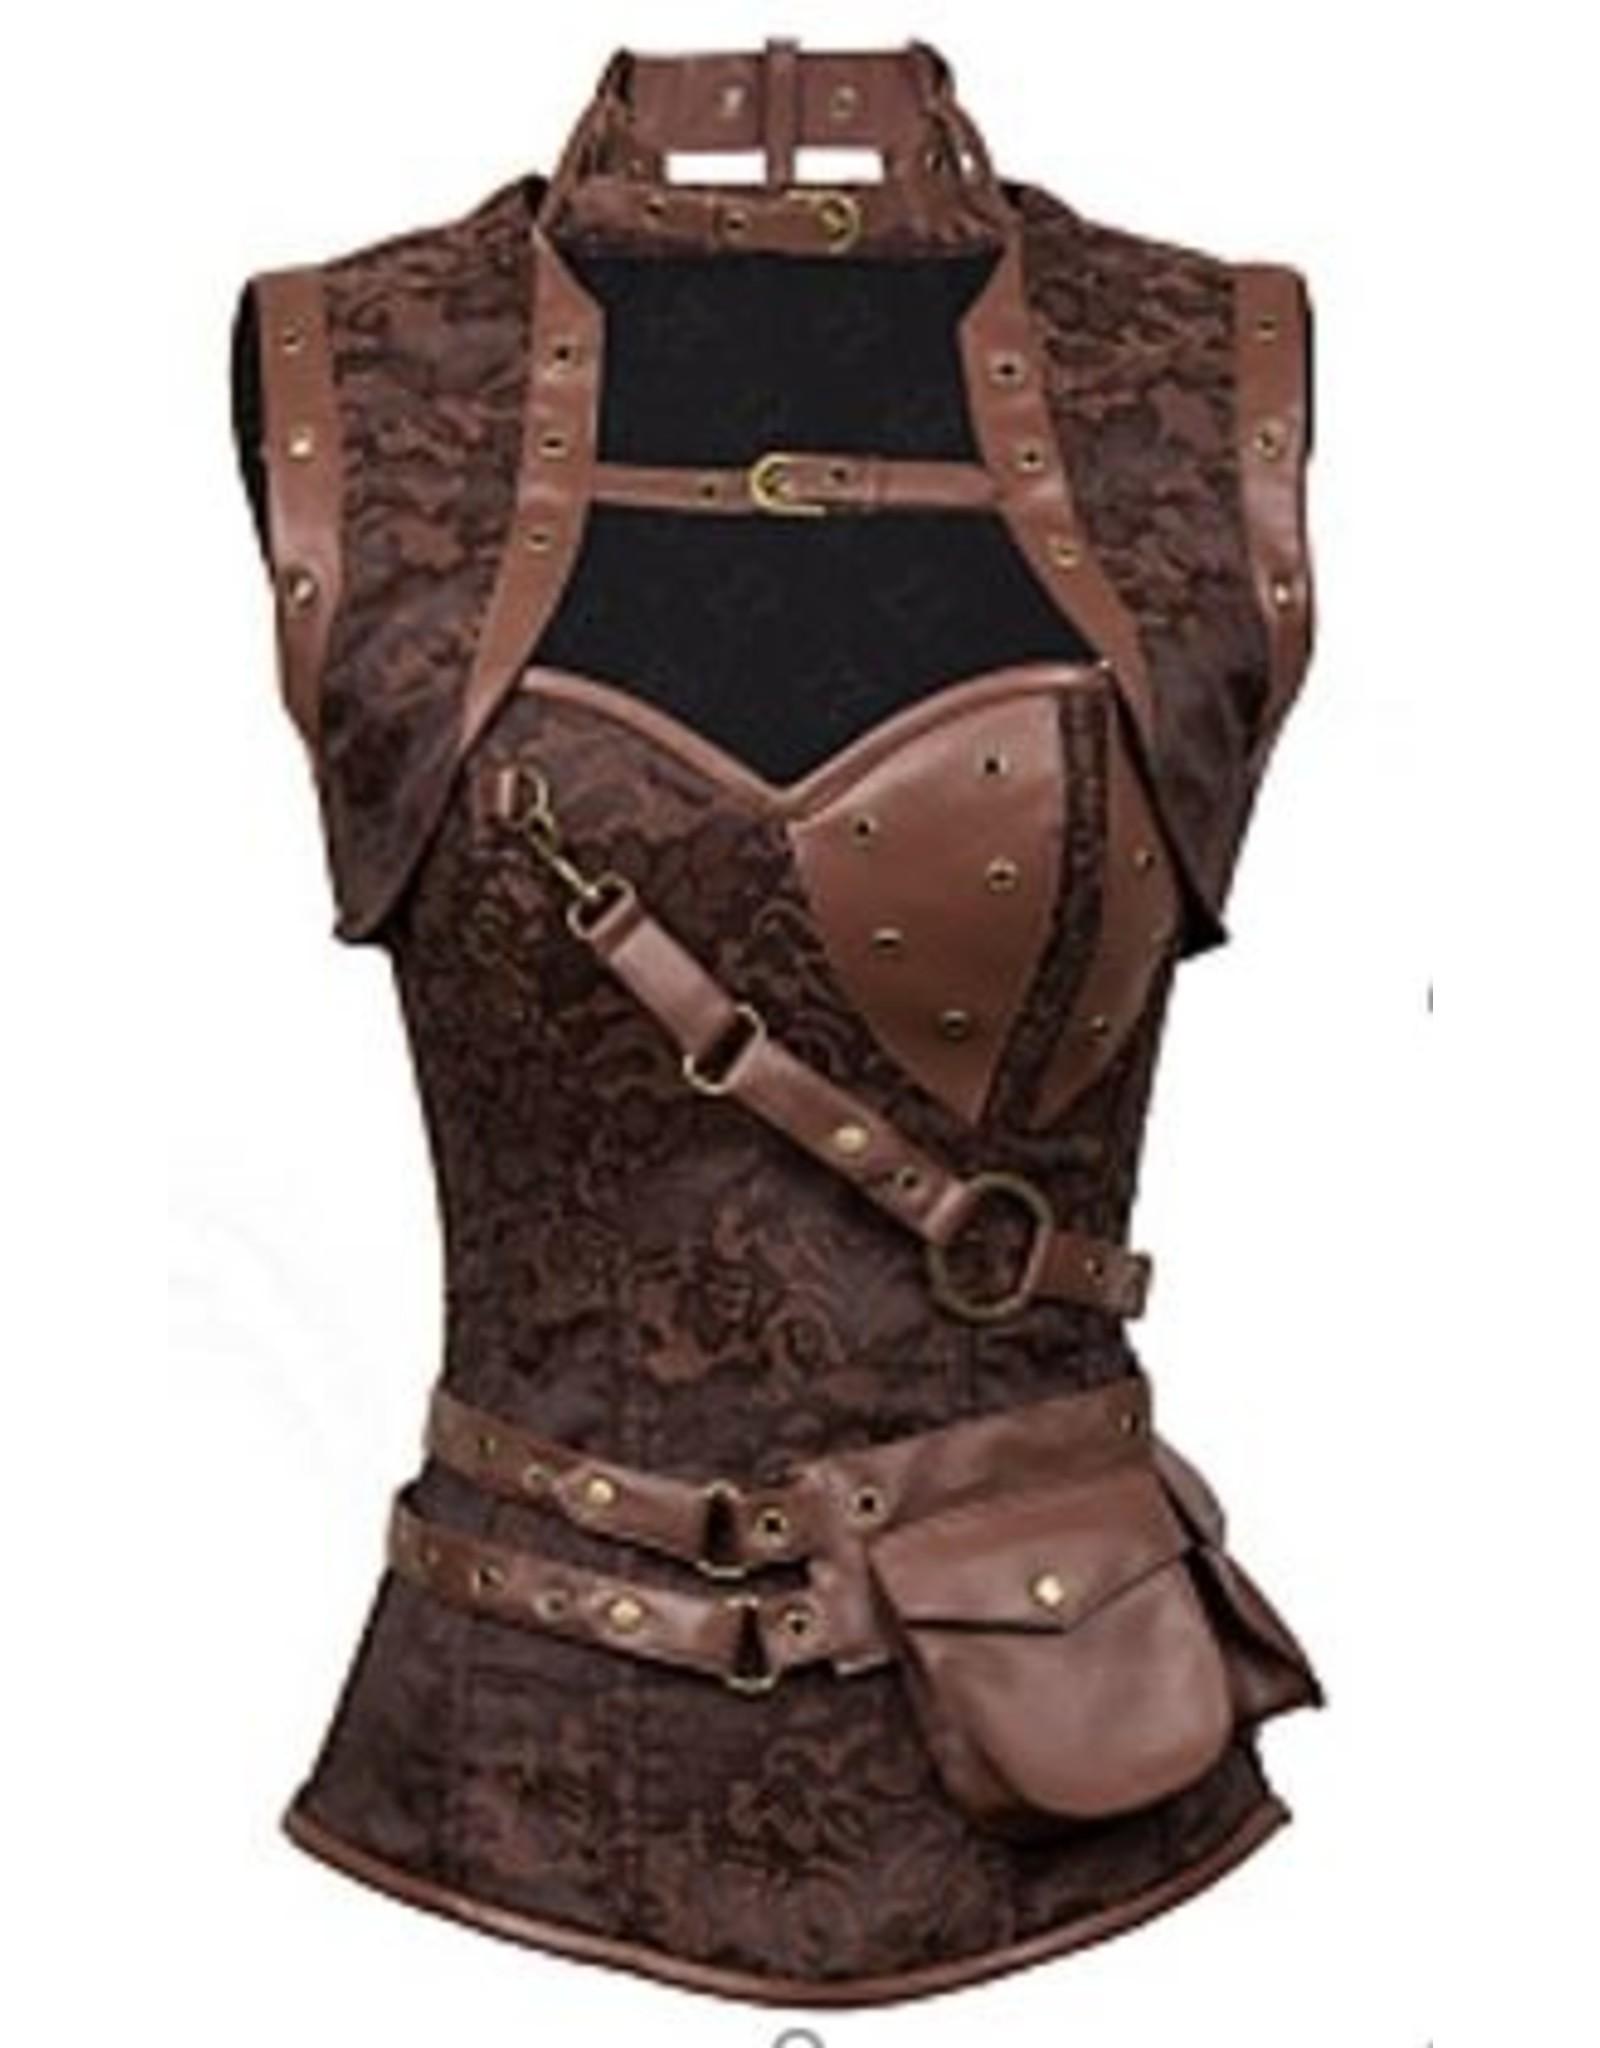 Western Fashion Steampunk Corset and Vest